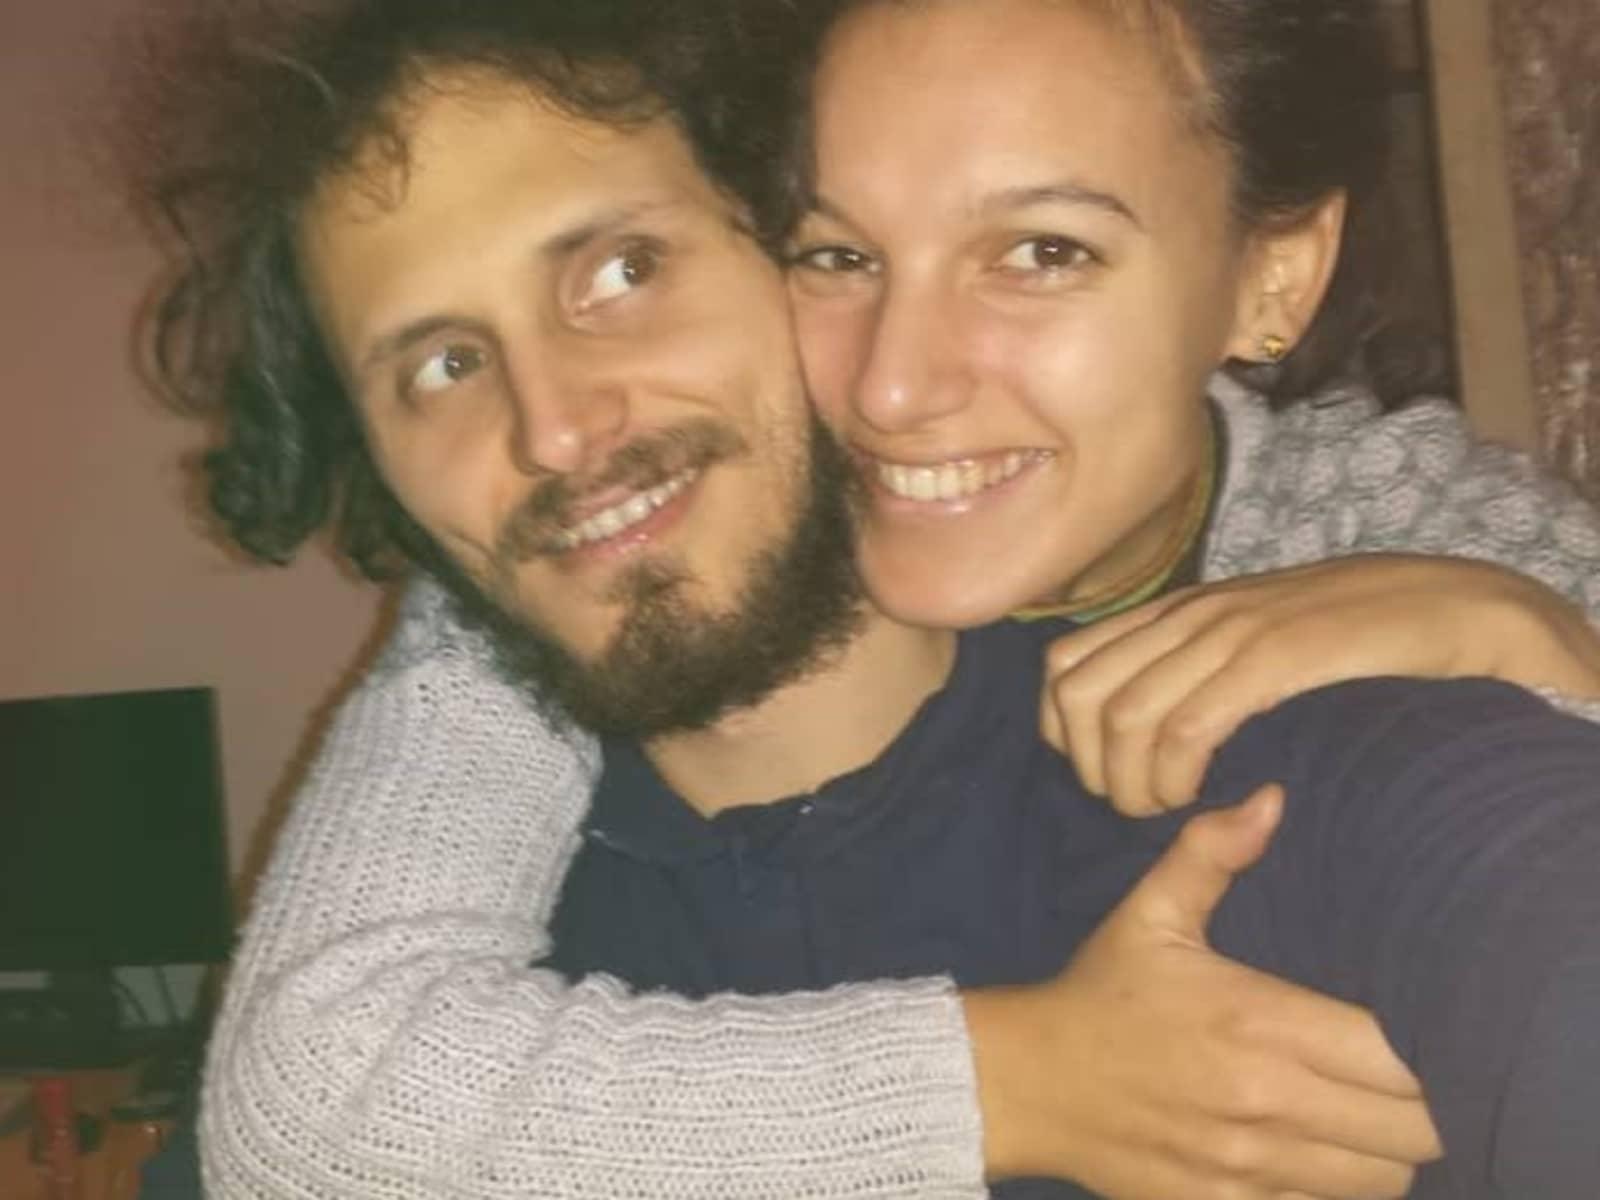 Lili & Stephan from Vienna, Austria